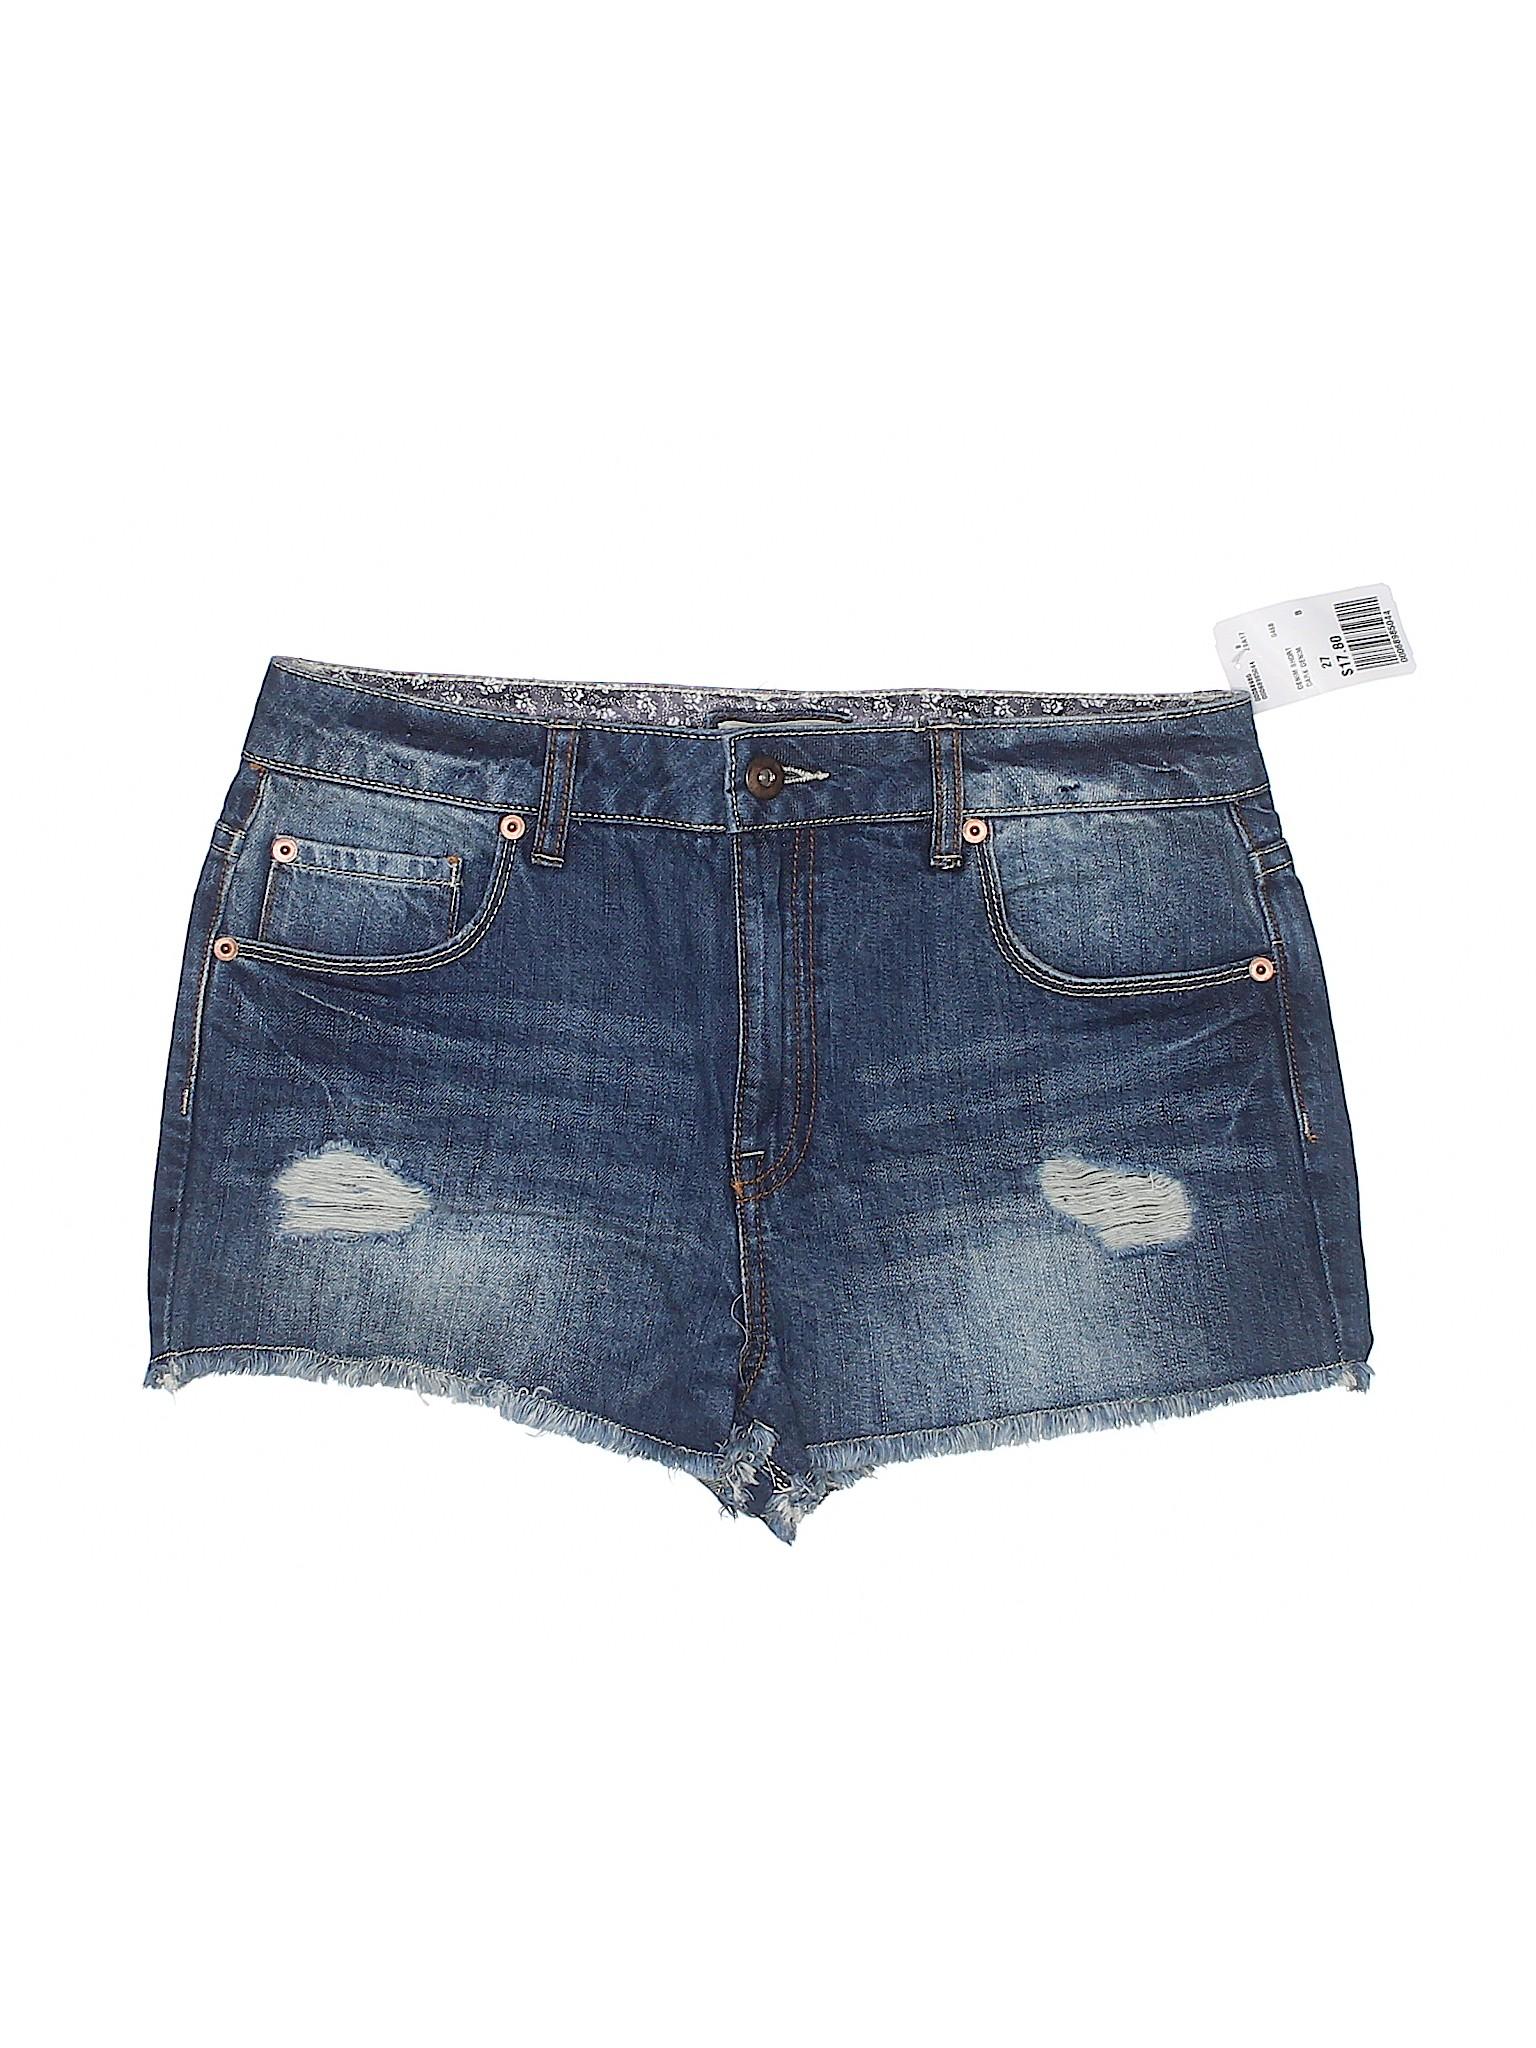 Boutique 21 Shorts Forever Boutique Forever Denim wFx0qYBS